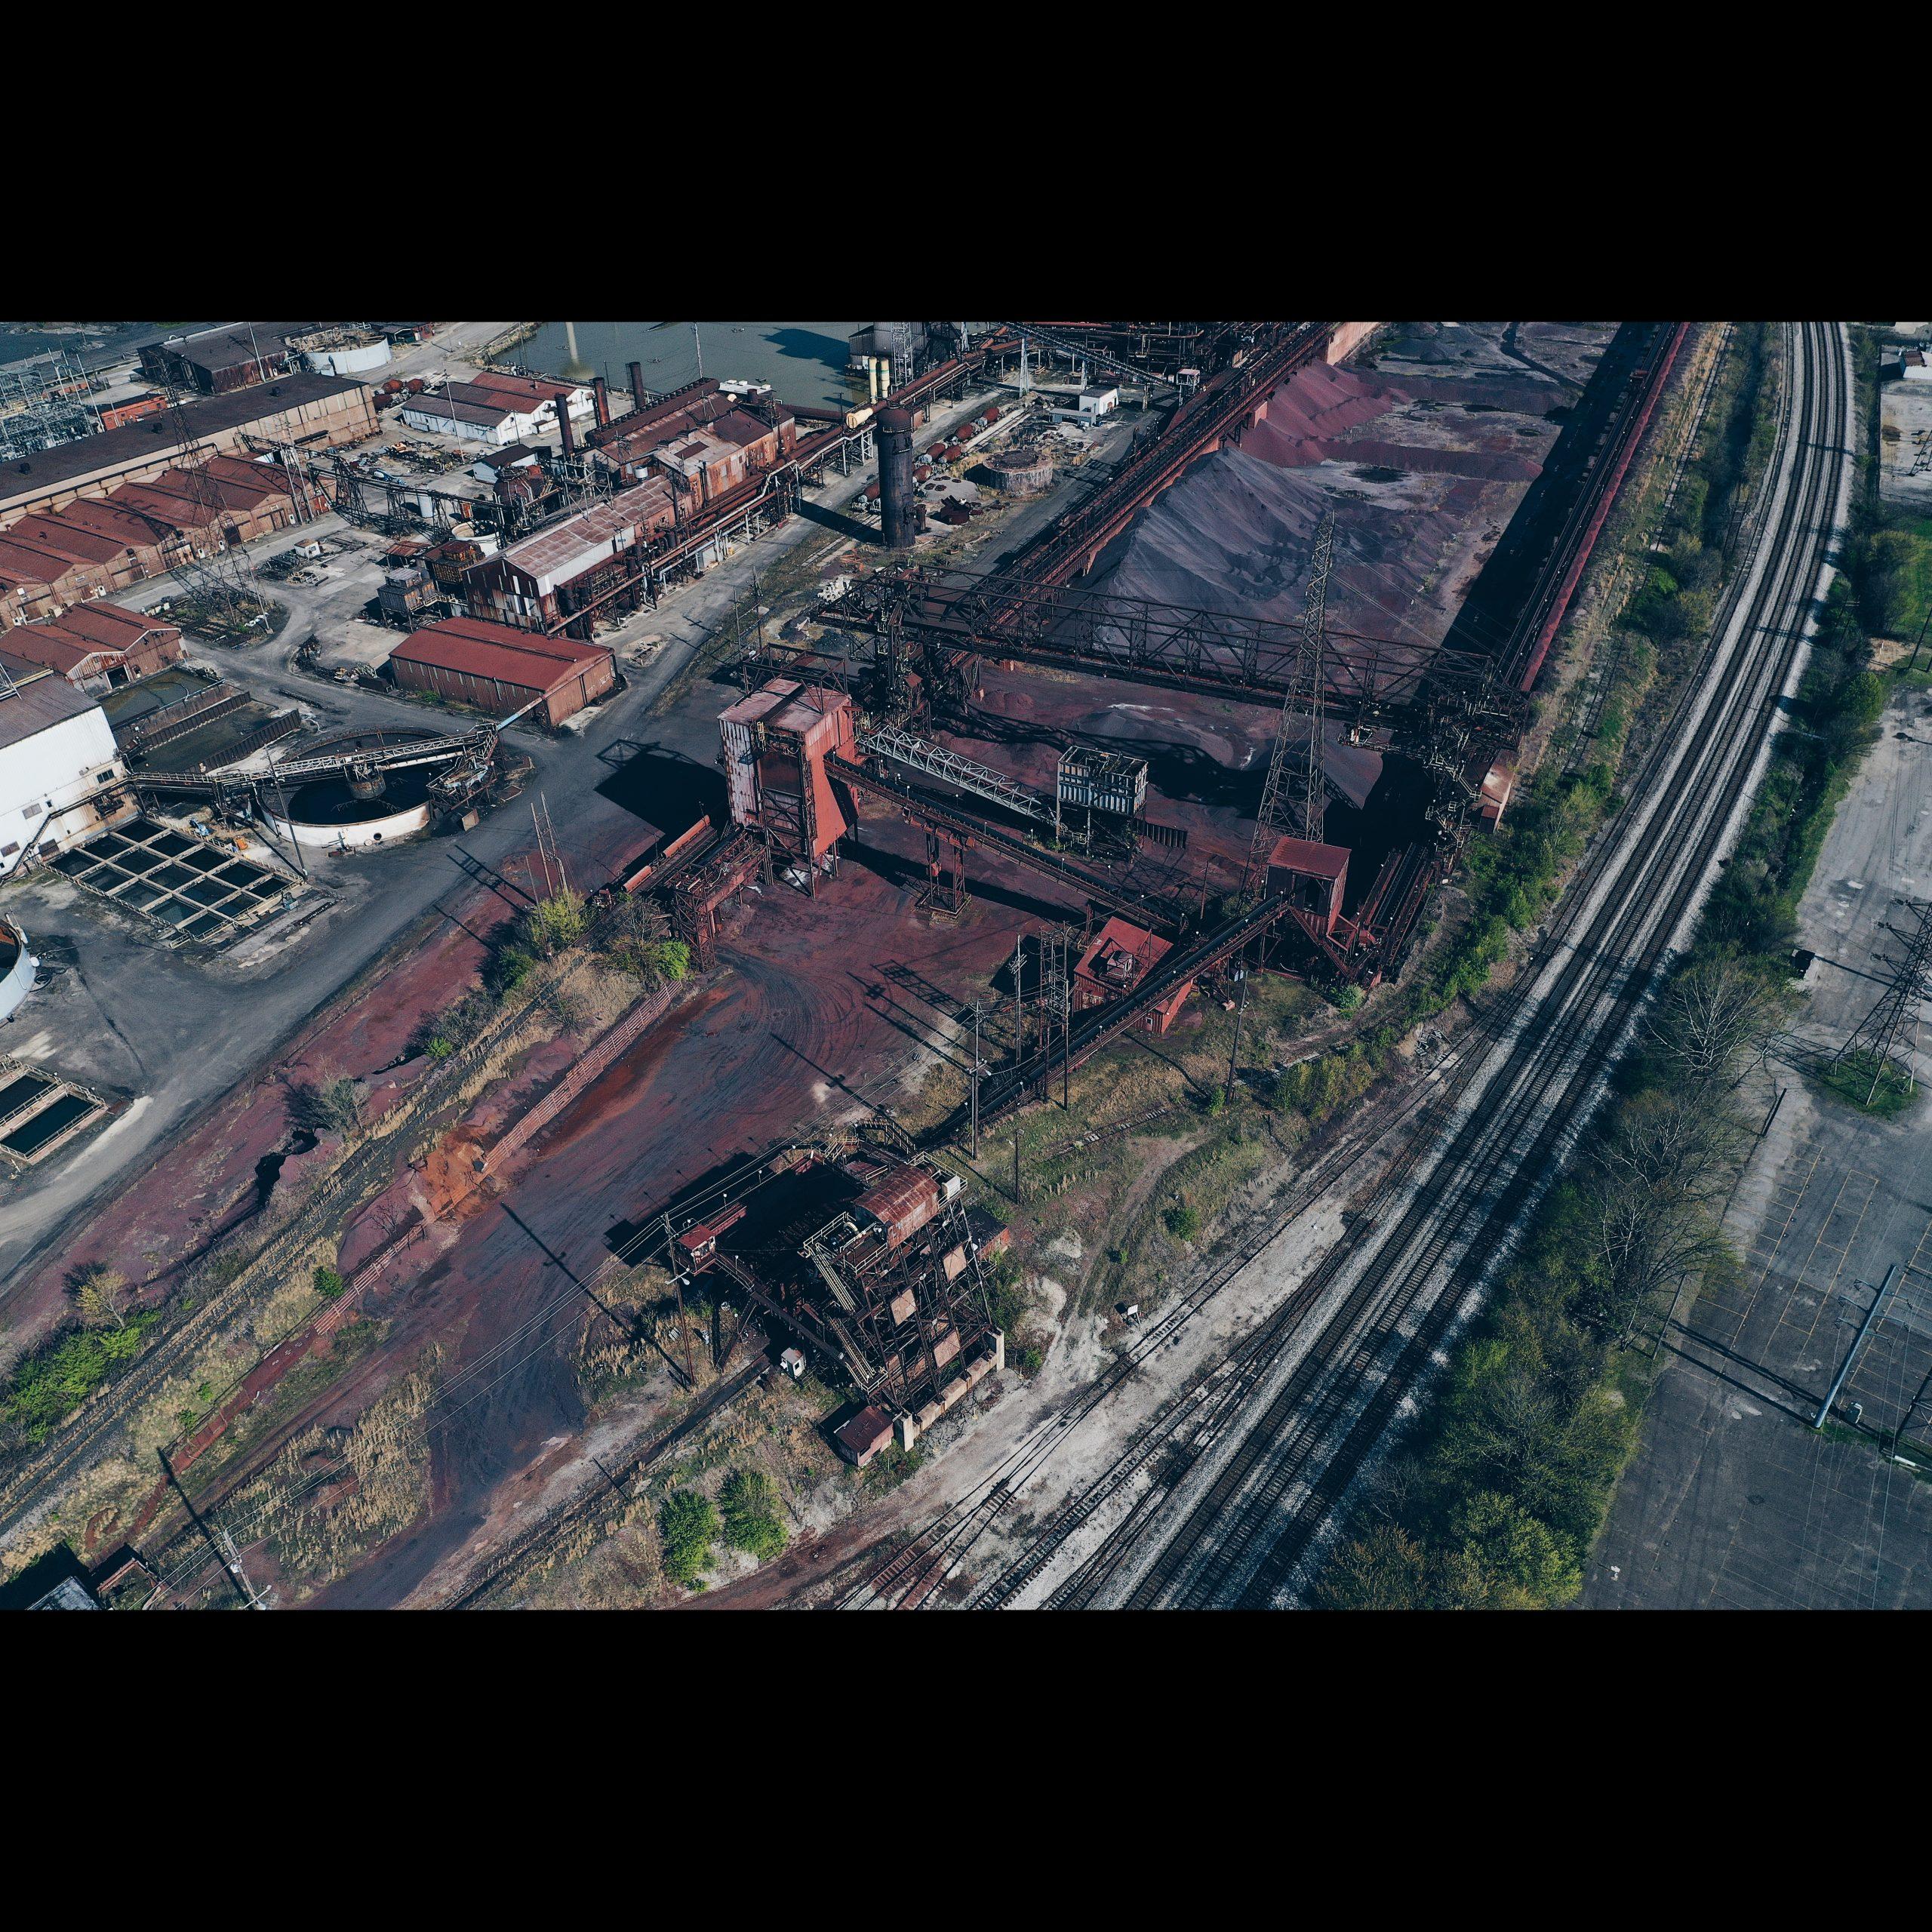 AK Steel Ashland Works - Ore Yard and Trestles